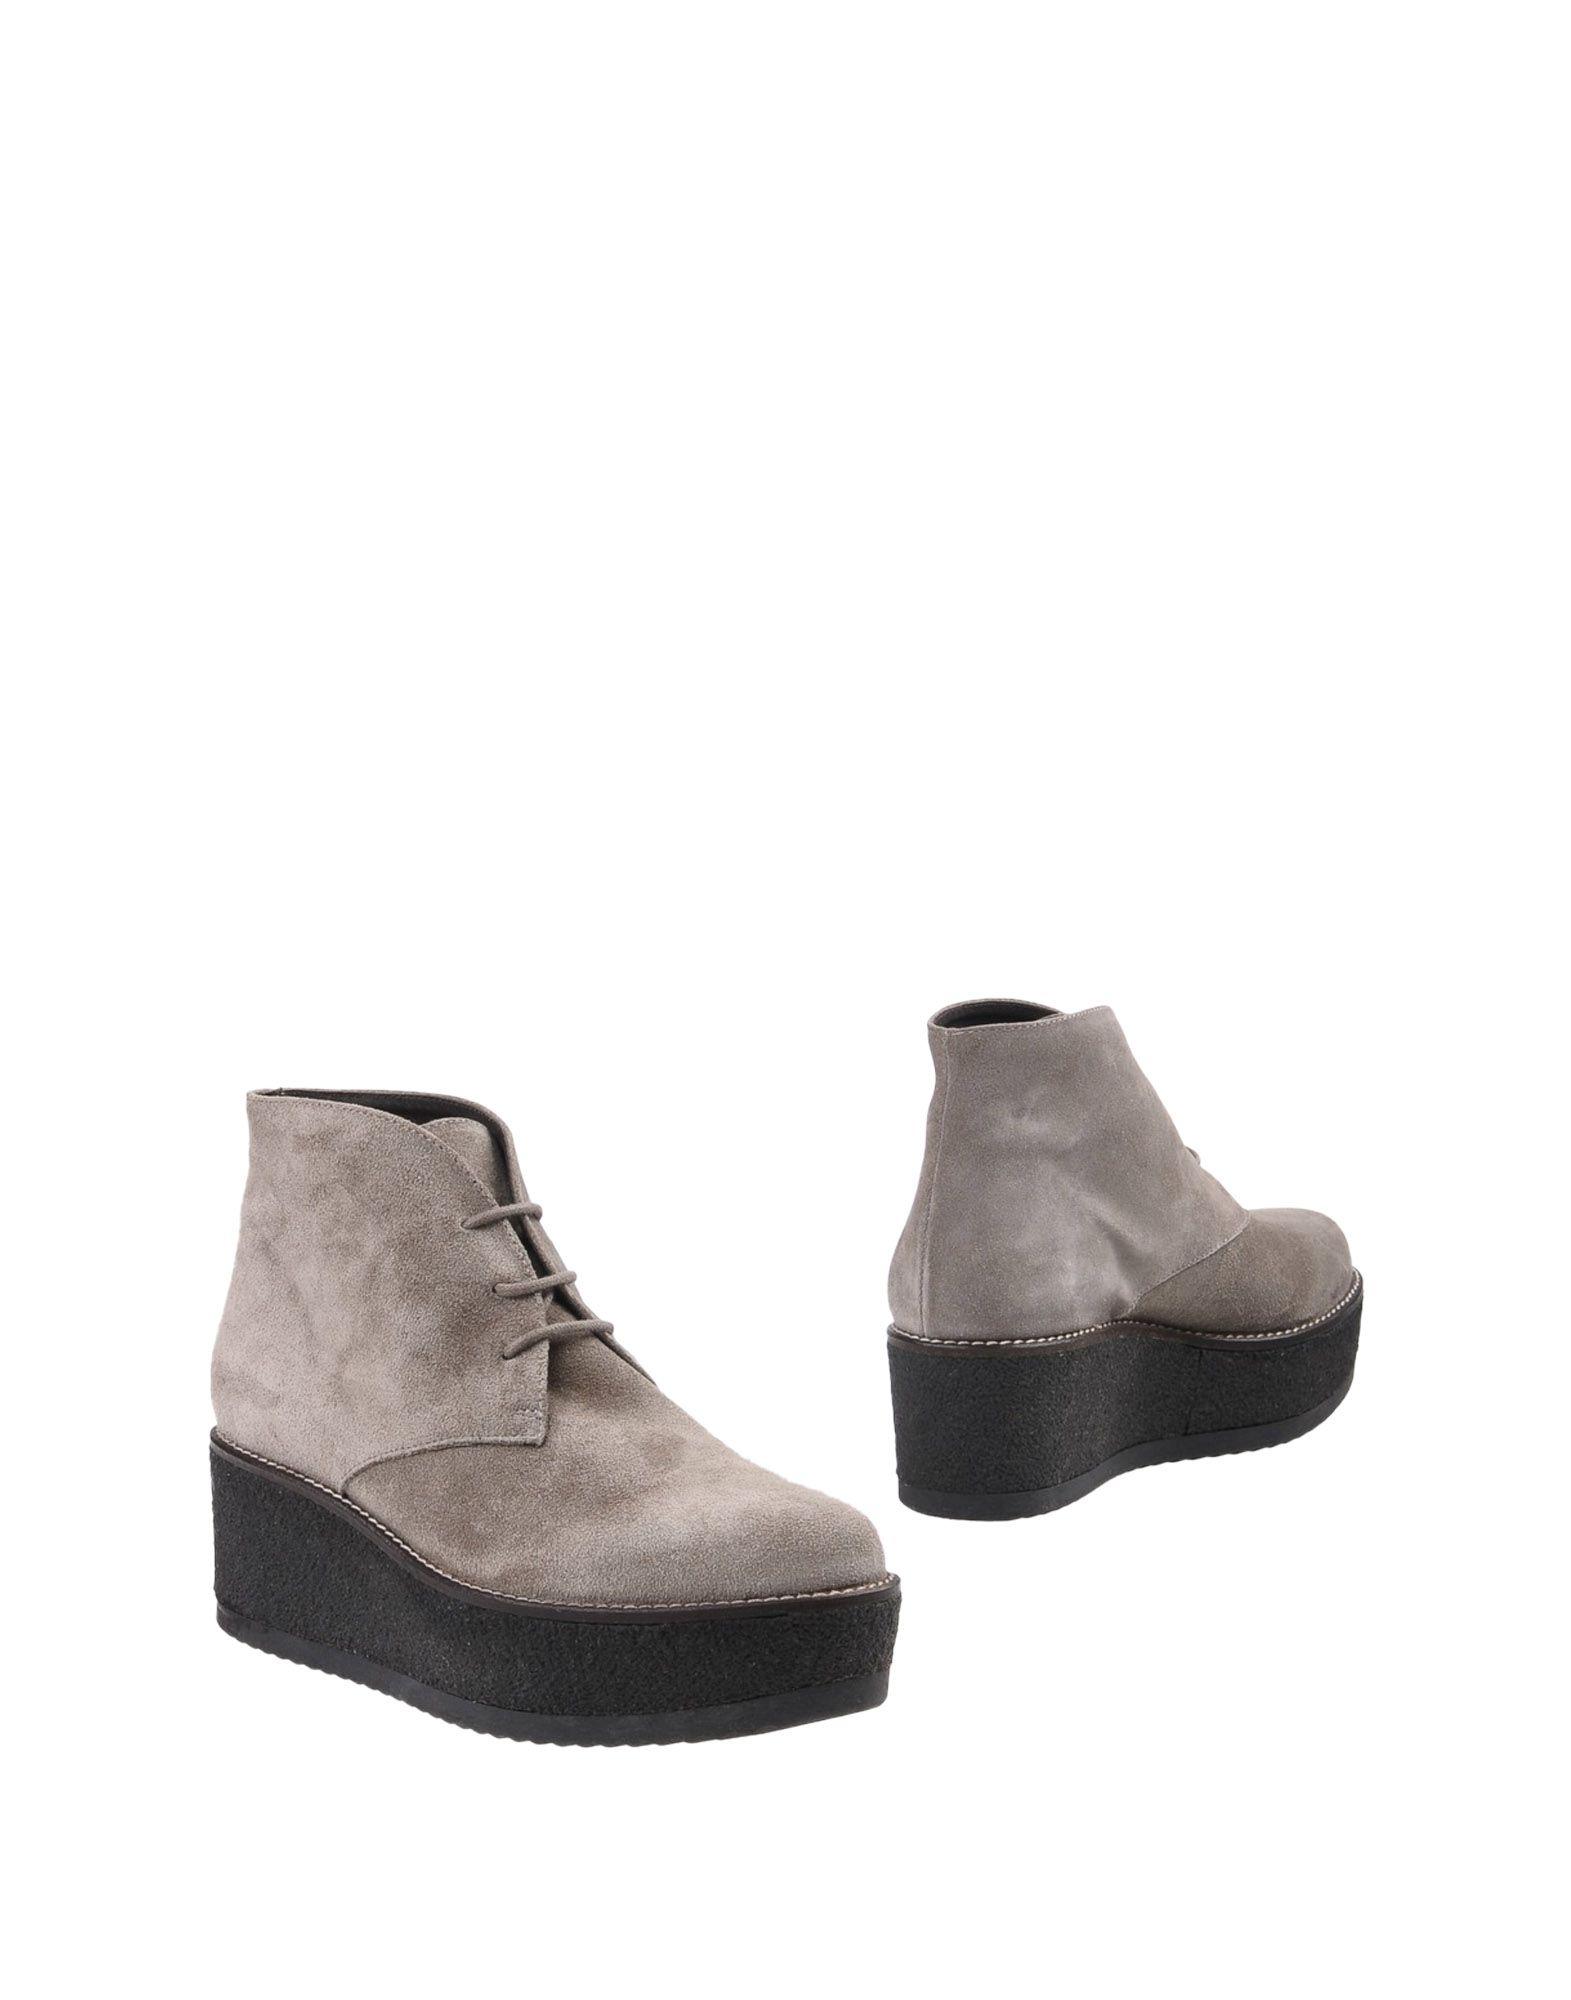 Logan Stiefelette Damen  Schuhe 11339592WQ Gute Qualität beliebte Schuhe  3425e0